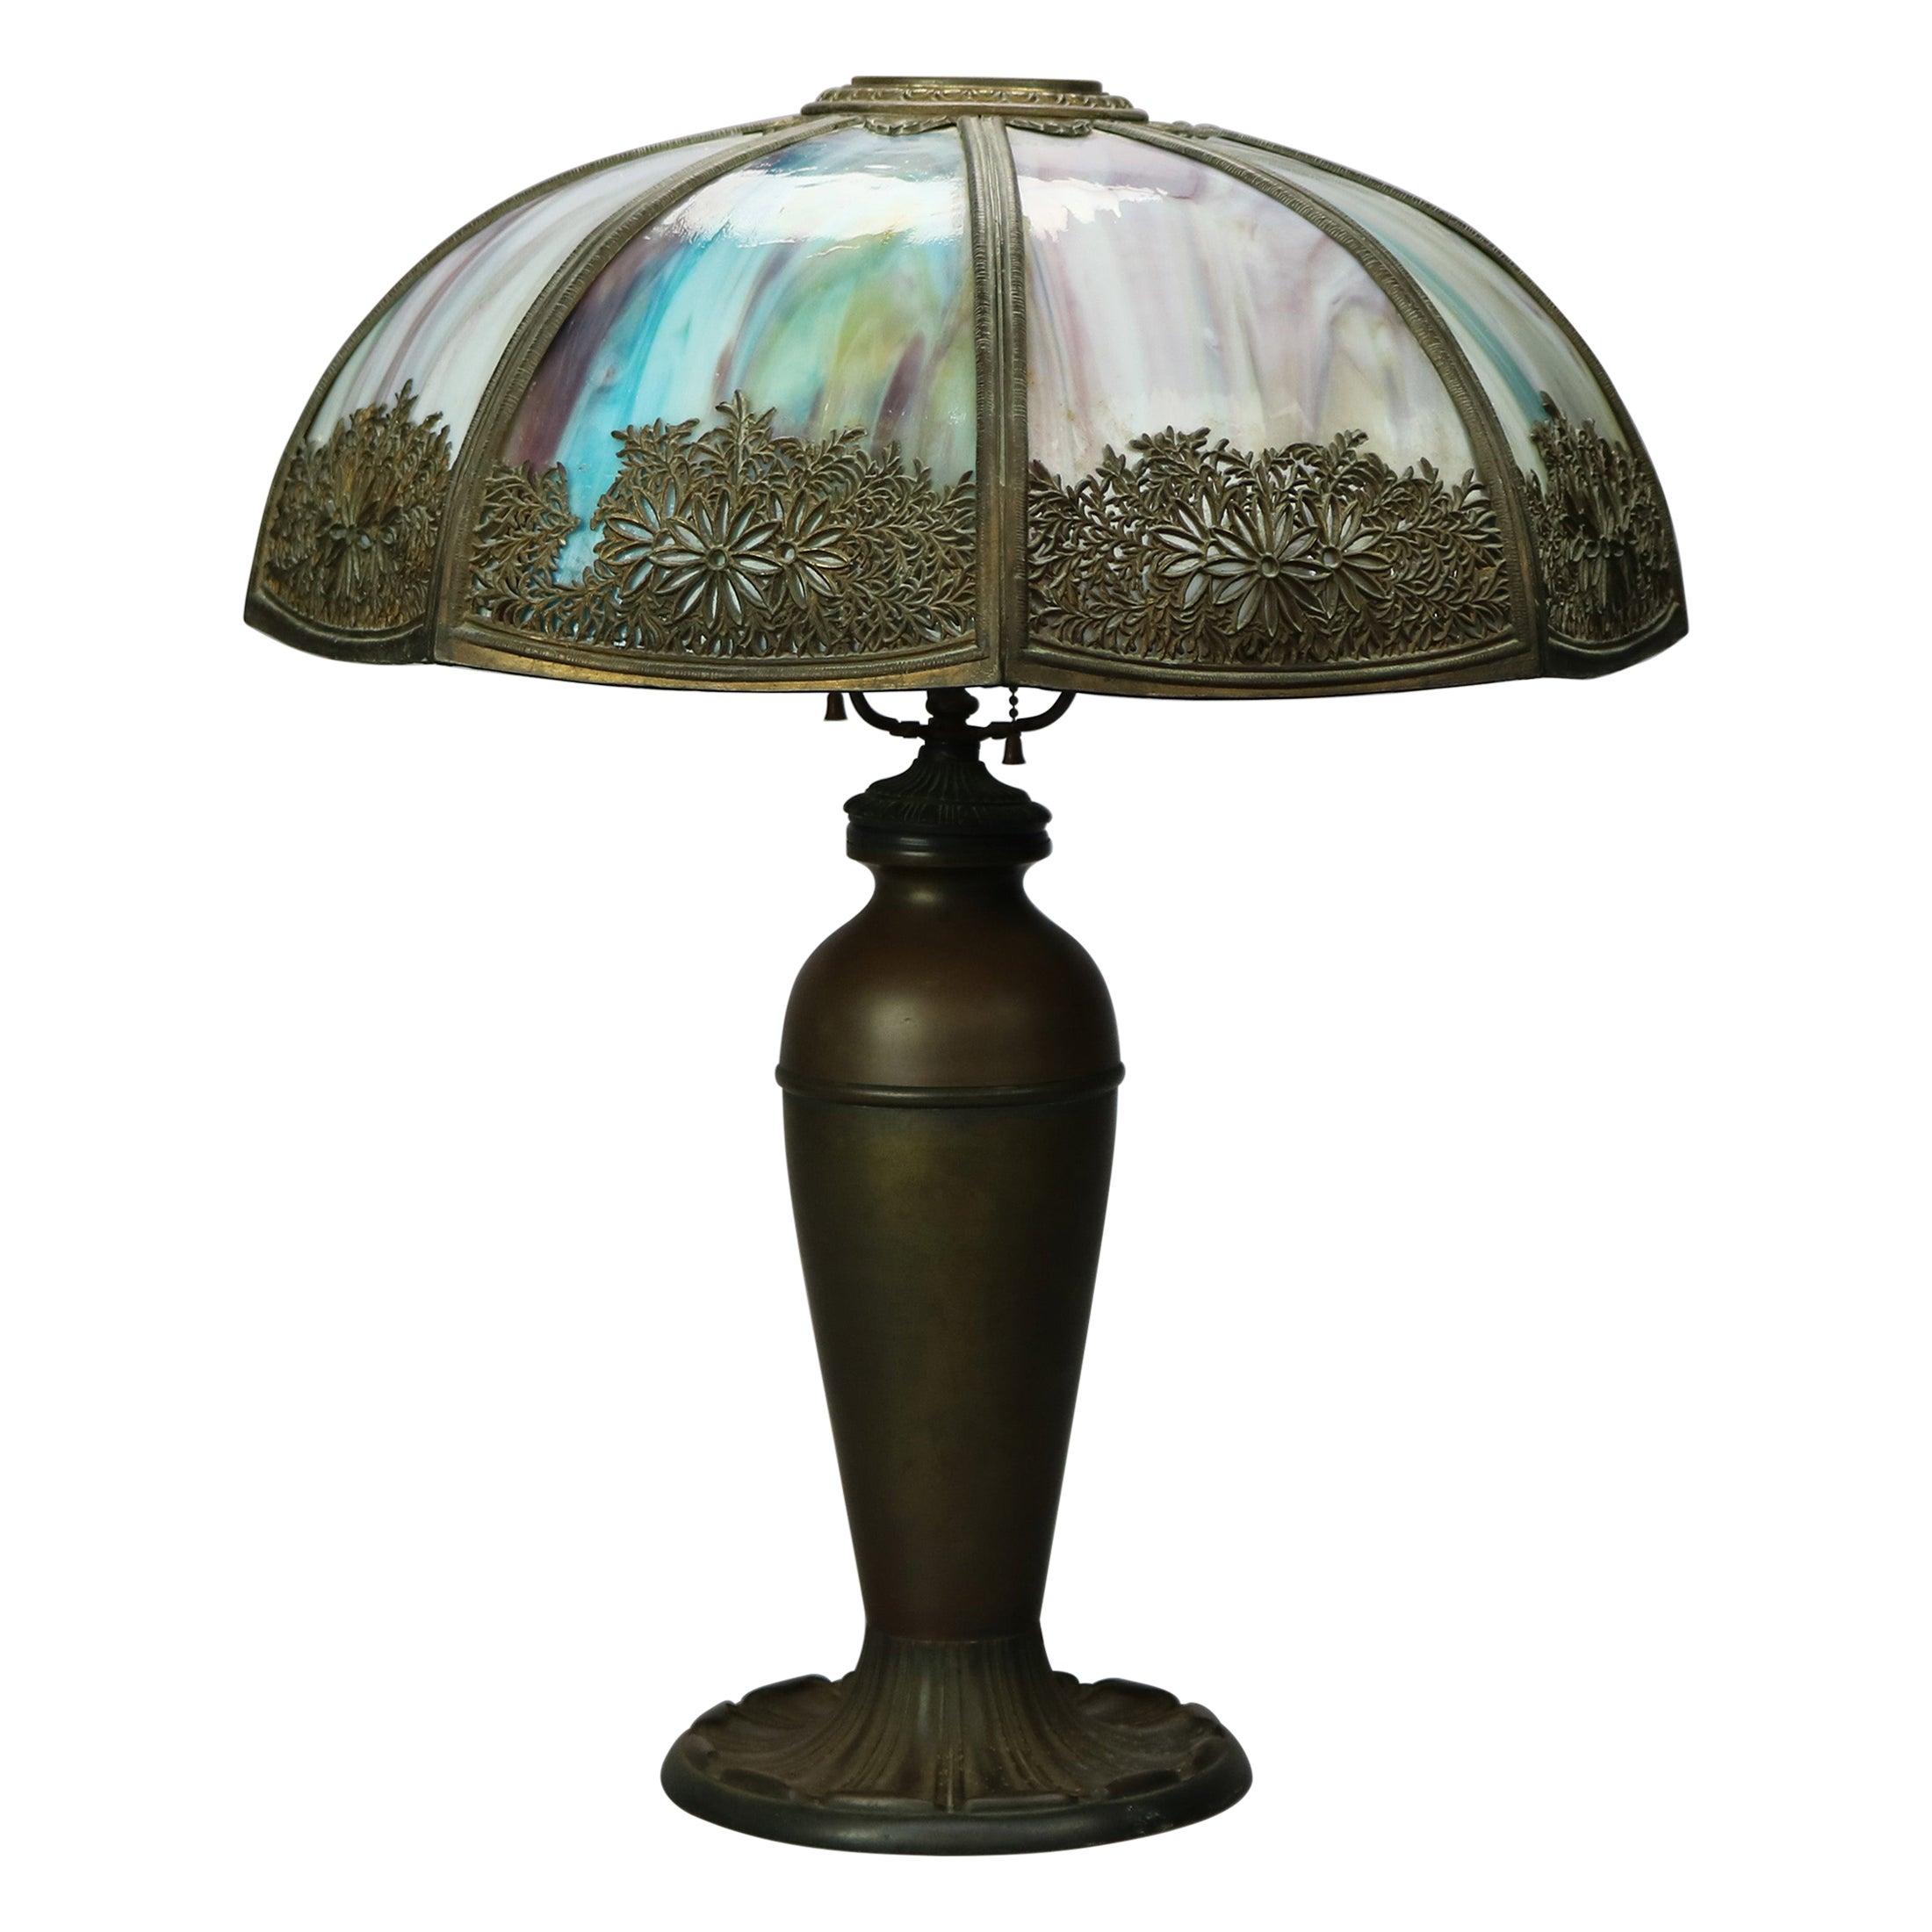 Antique Arts & Crafts Bradley & Hubbard School Slag Glass Table Lamp, c 1920